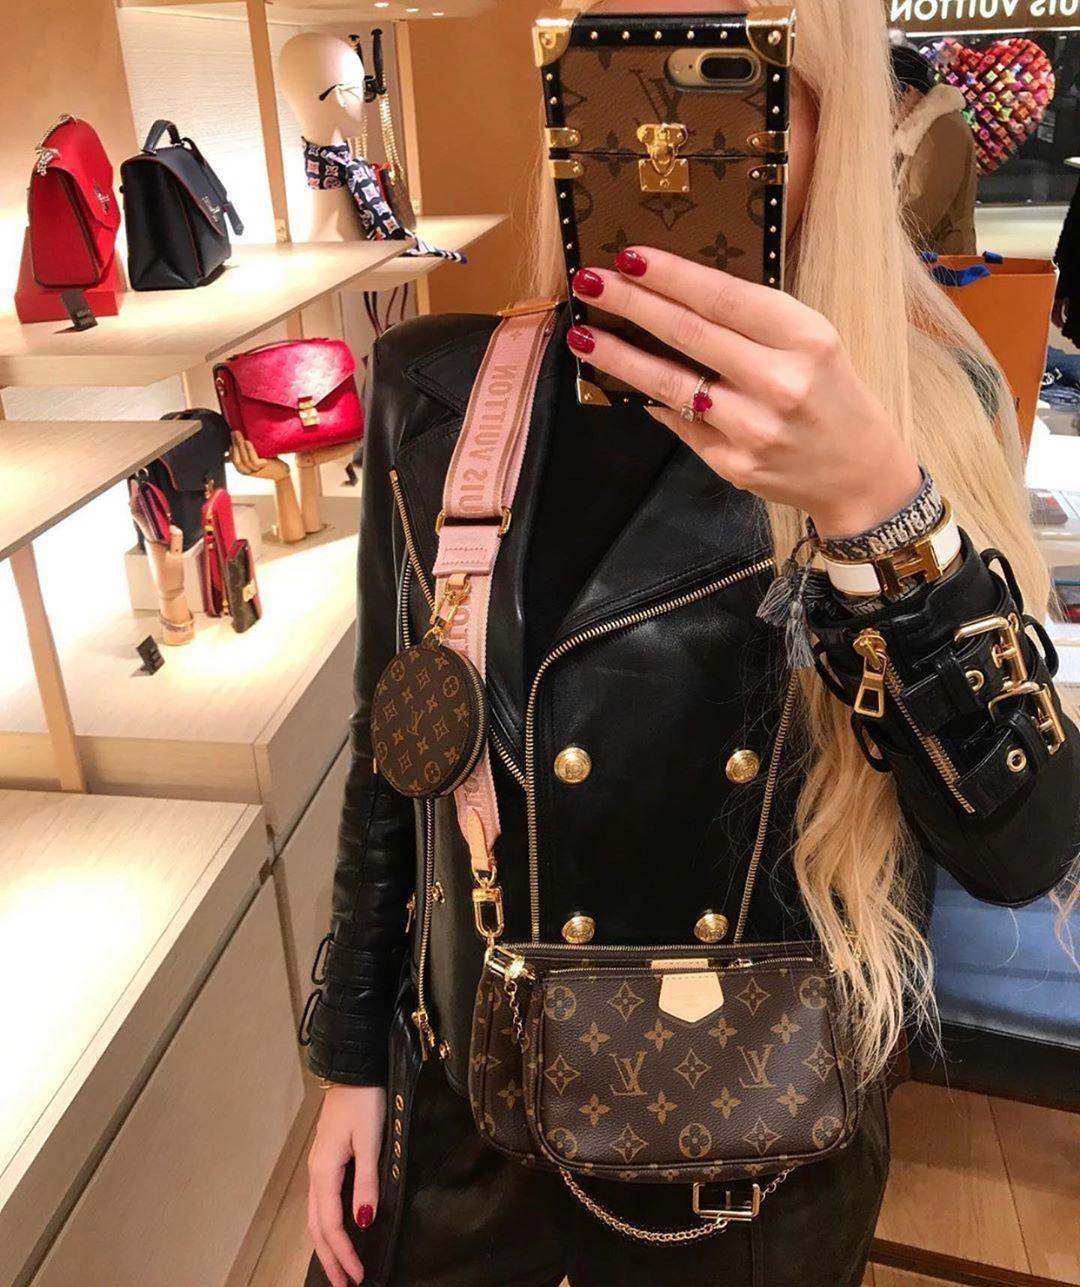 High Quality Replica Handbags Best Fake Designer Bags Vaskor